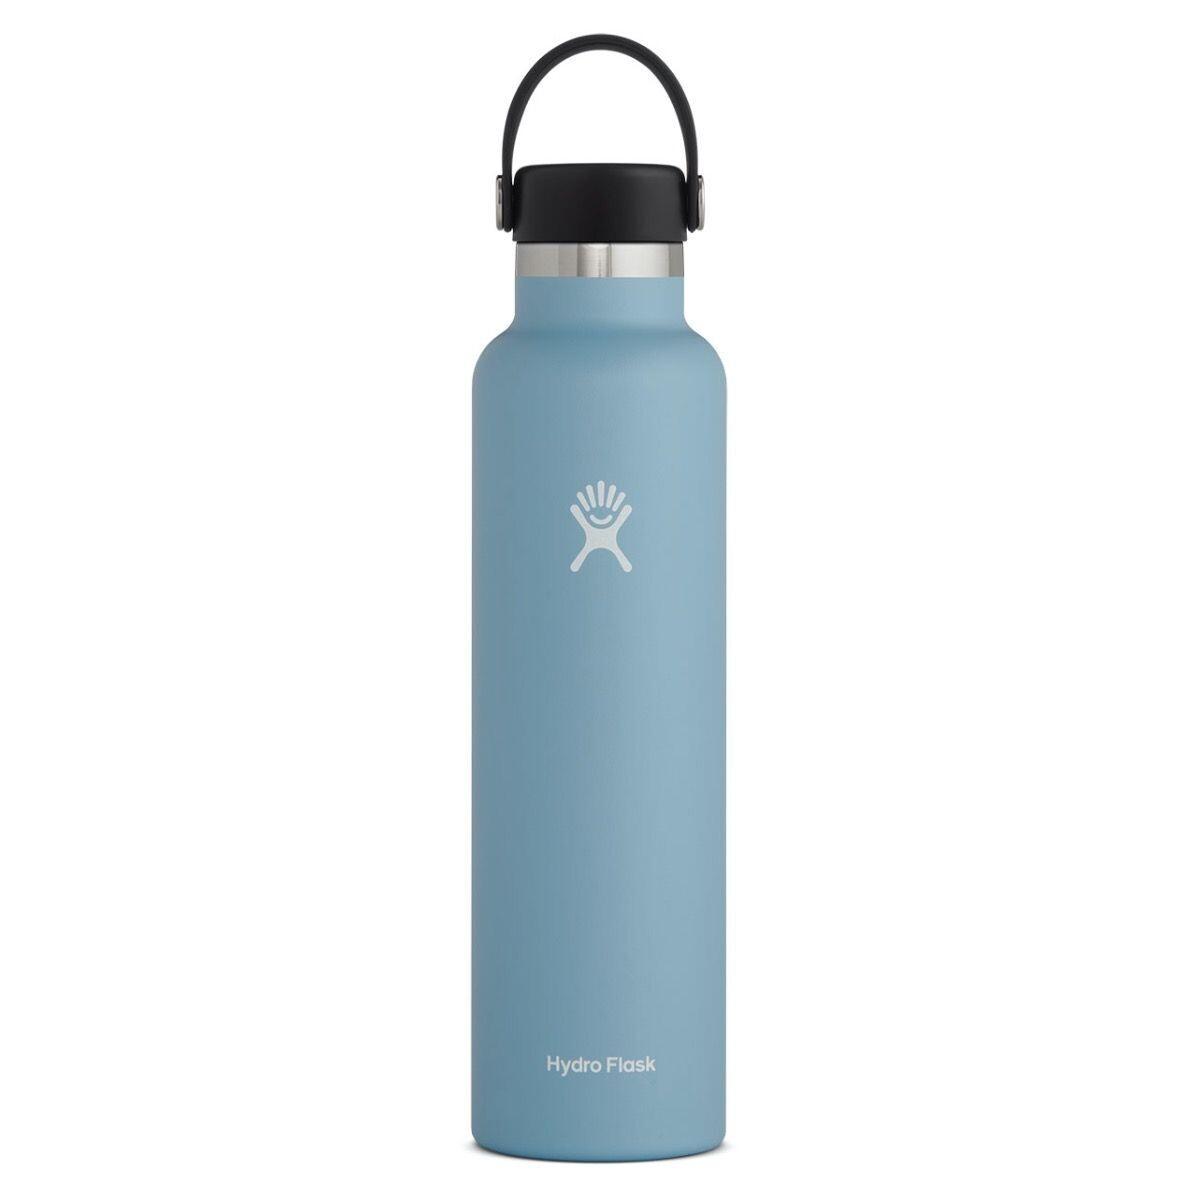 Hydro Flask 24 oz Standard Mouth w/Flex Cap RAIN